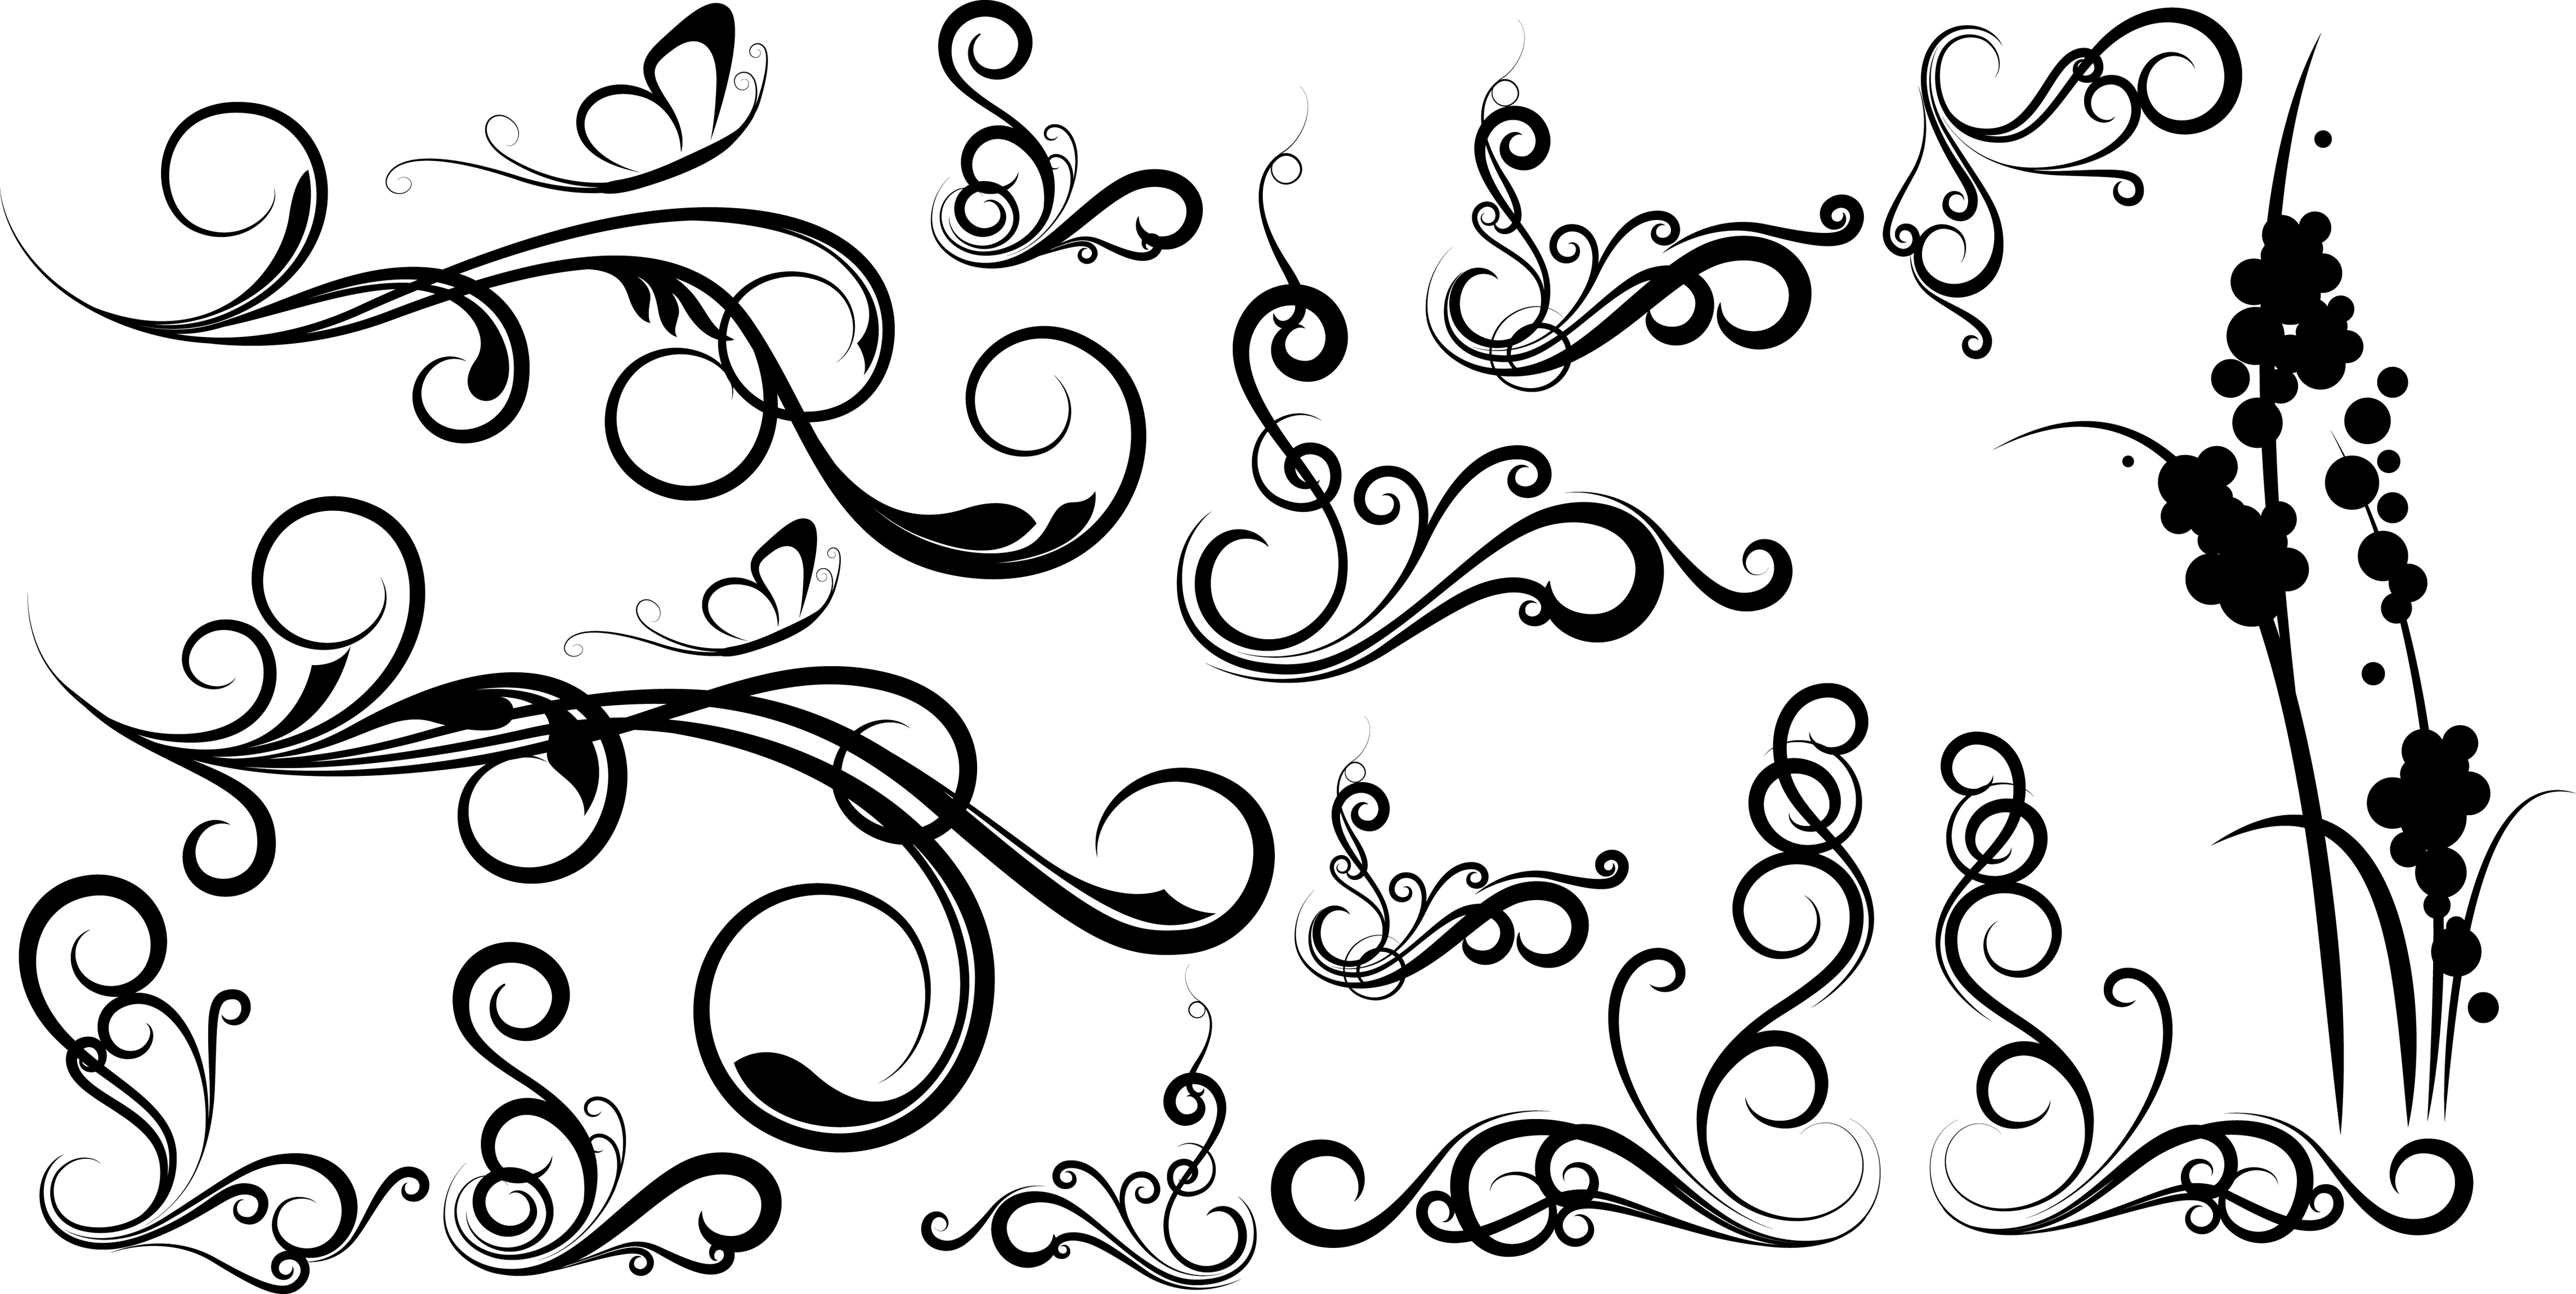 simple swirl vector - HD4577×2300